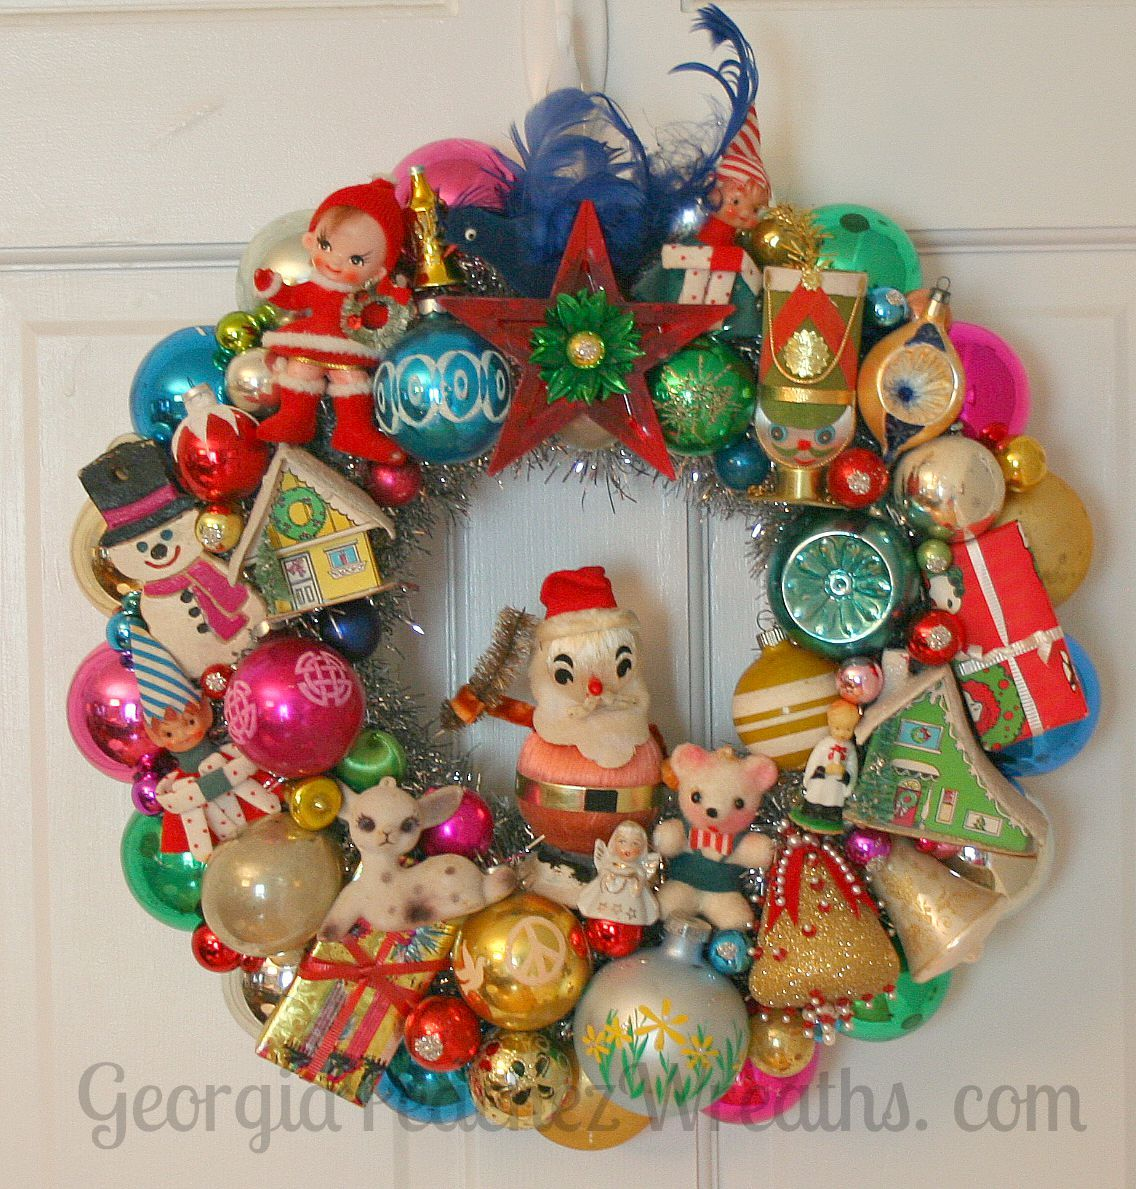 Vintage Ornament Wreath Georgiapeachezwreaths Com Kitsch Christmas Vintage Christmas Ornaments Vintage Ornament Wreath